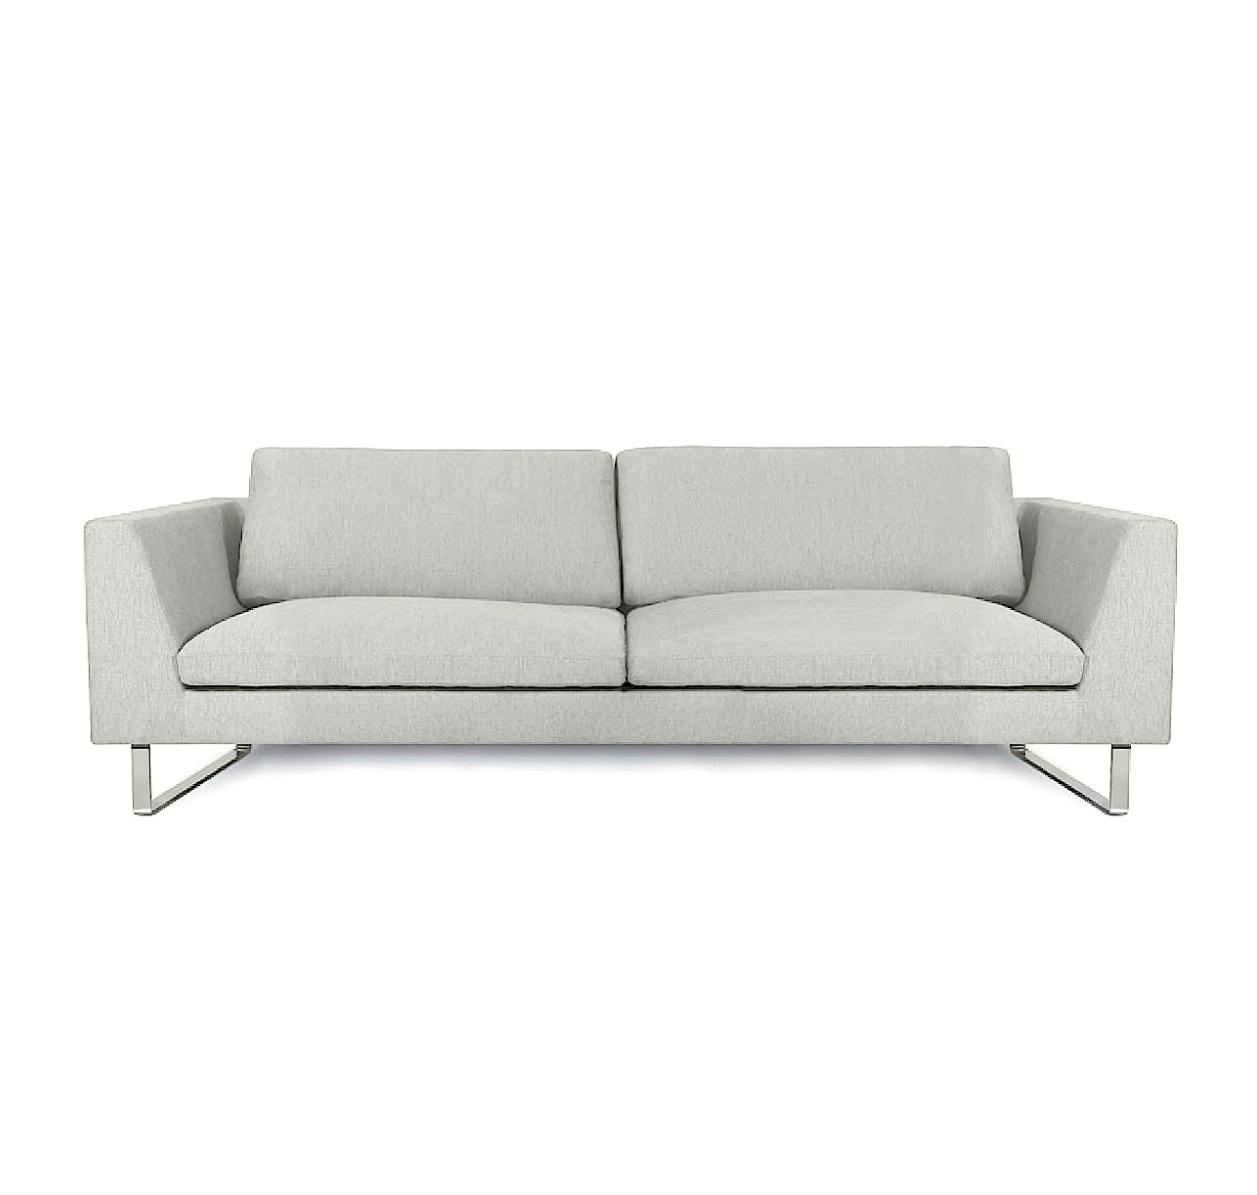 Osaka 2 Seater Sofa-0